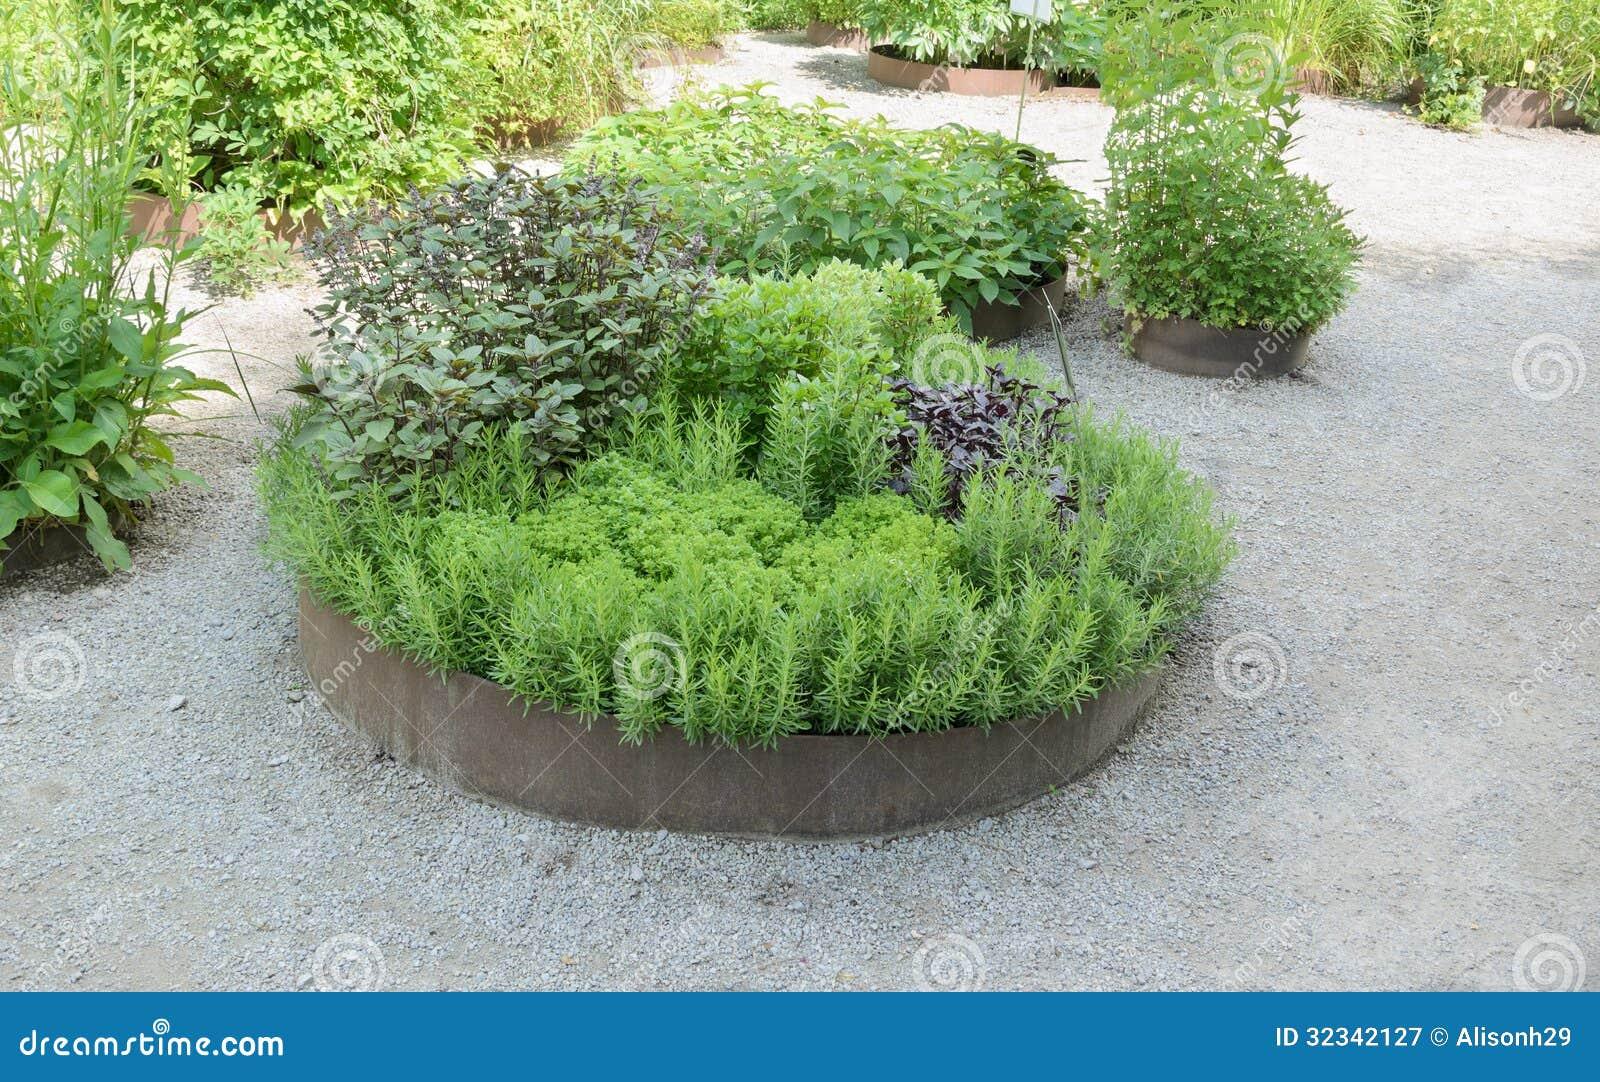 Free stock photo of garden - Herb Garden